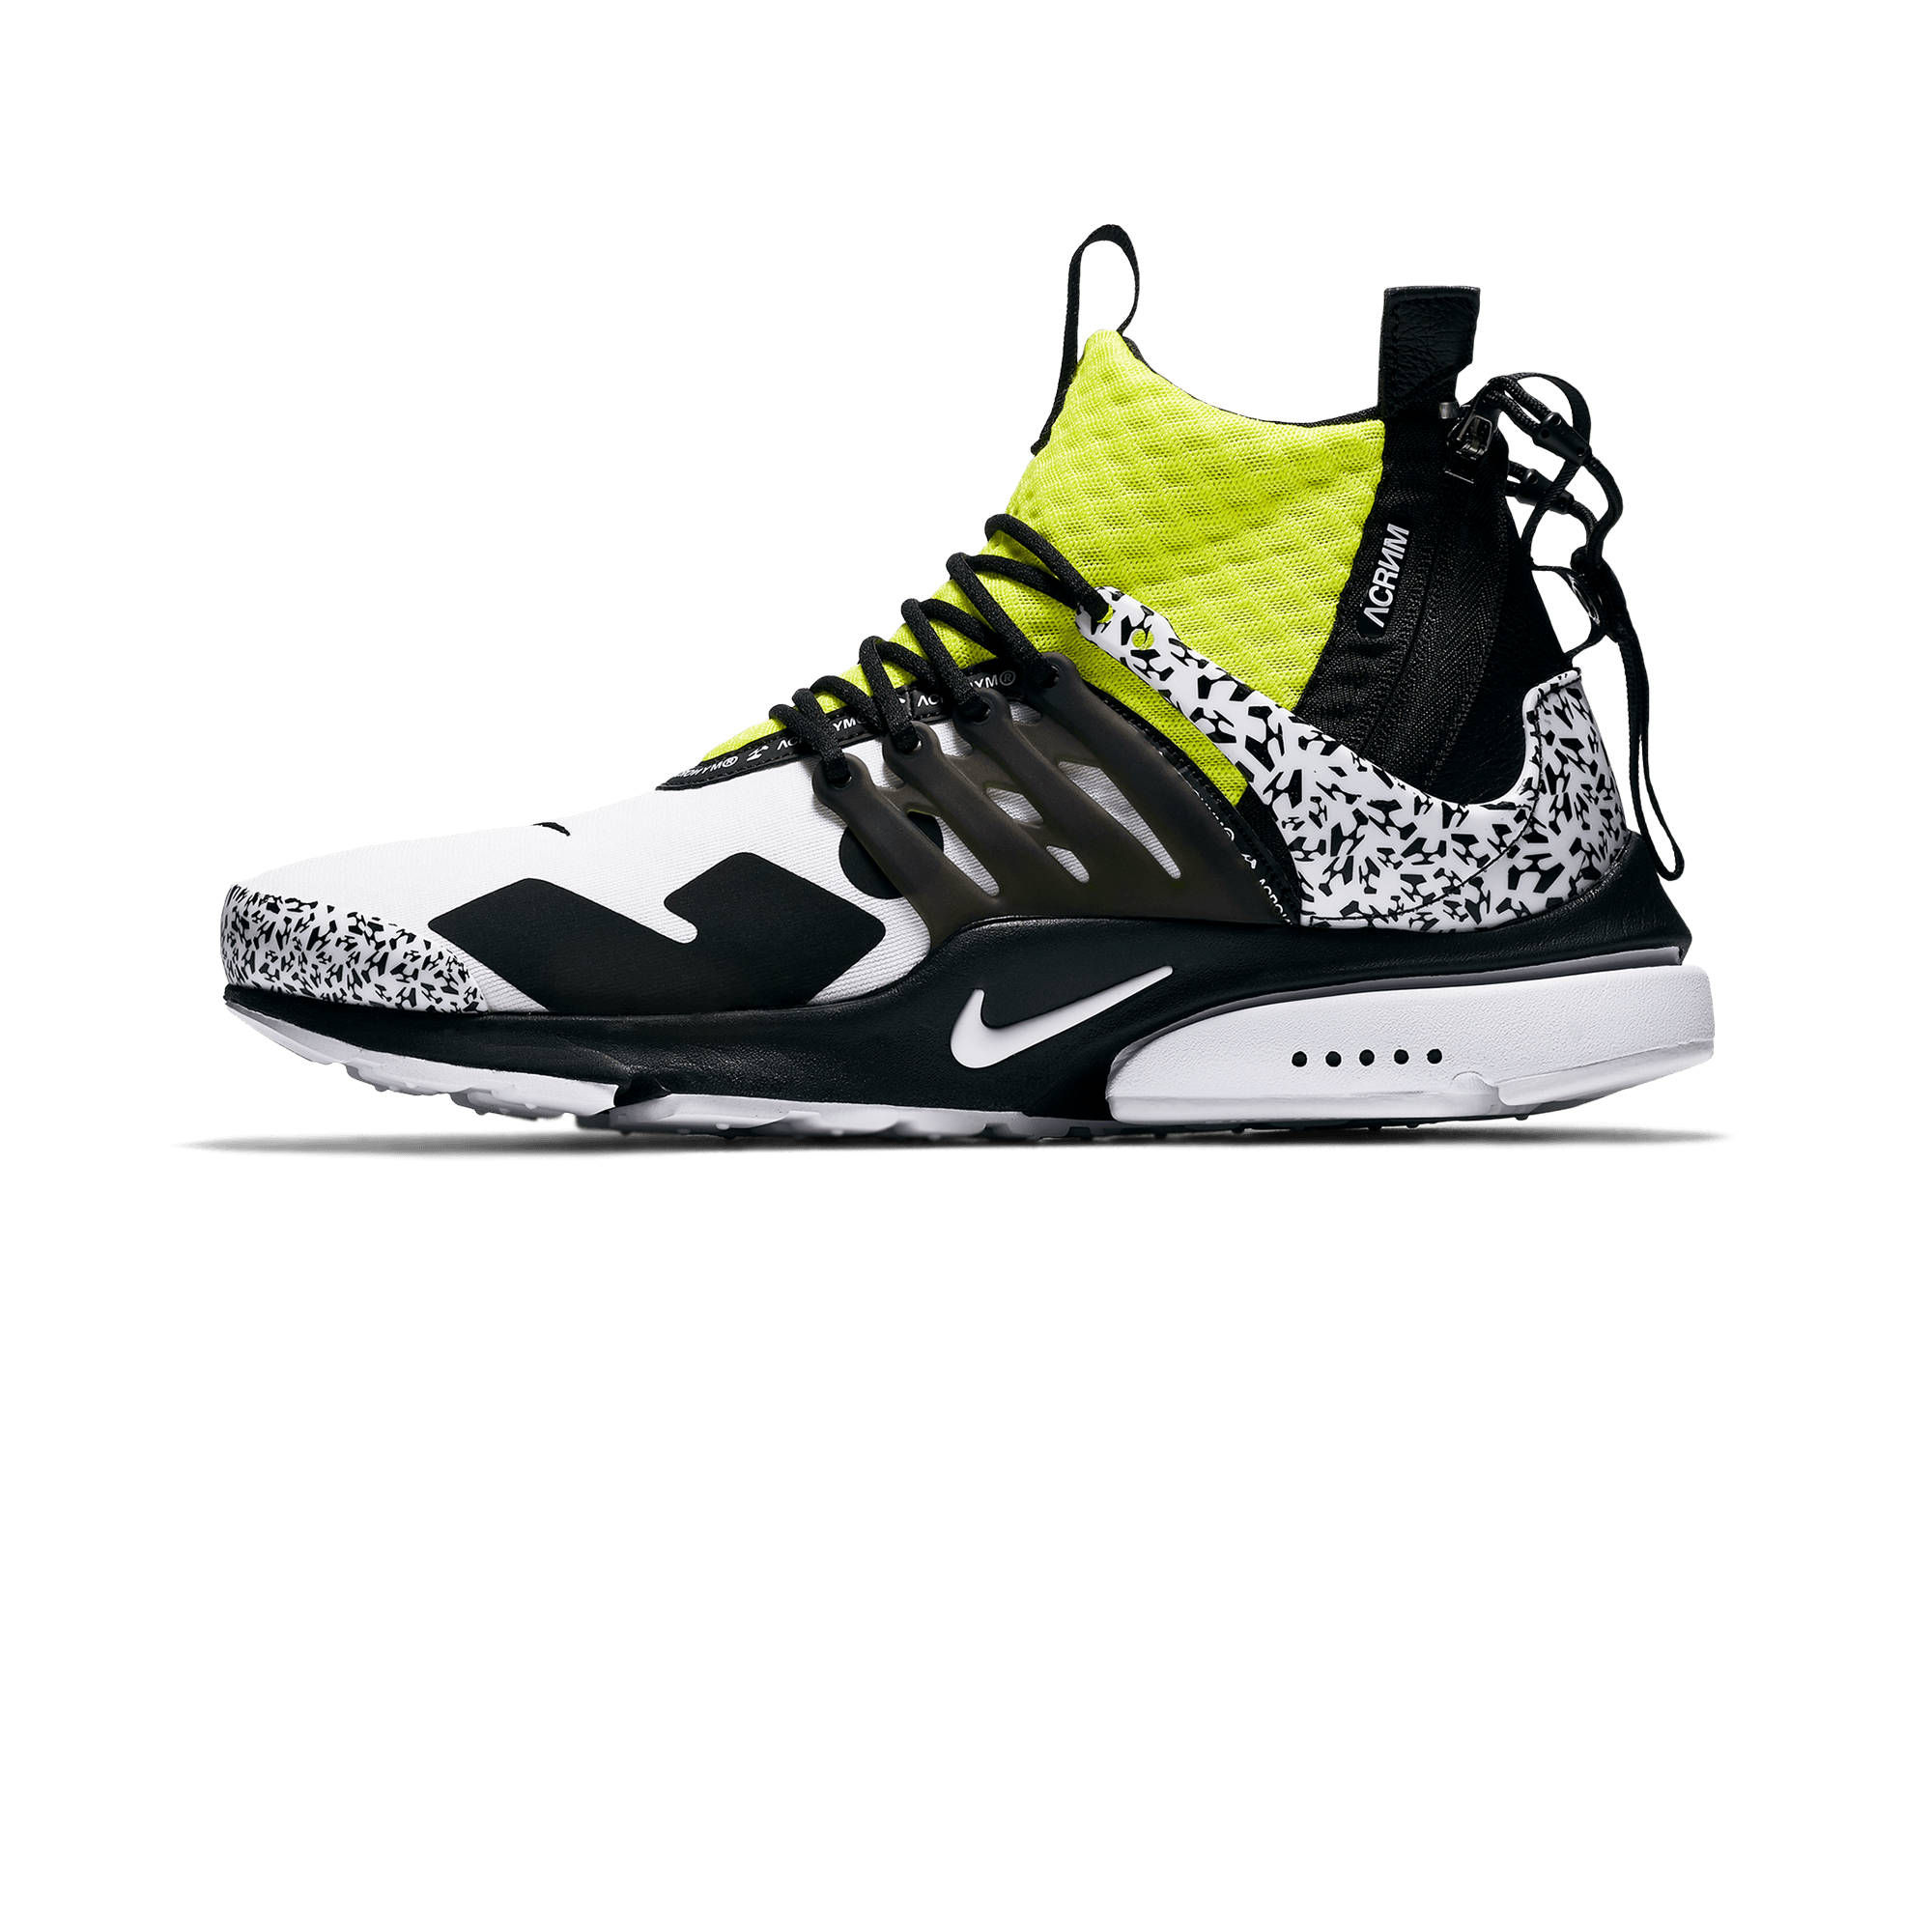 no sale tax top quality great deals 2017 Nike Air Presto Mid X Acronym white/black/dynamic yellow - Men |  Holypopstore.com